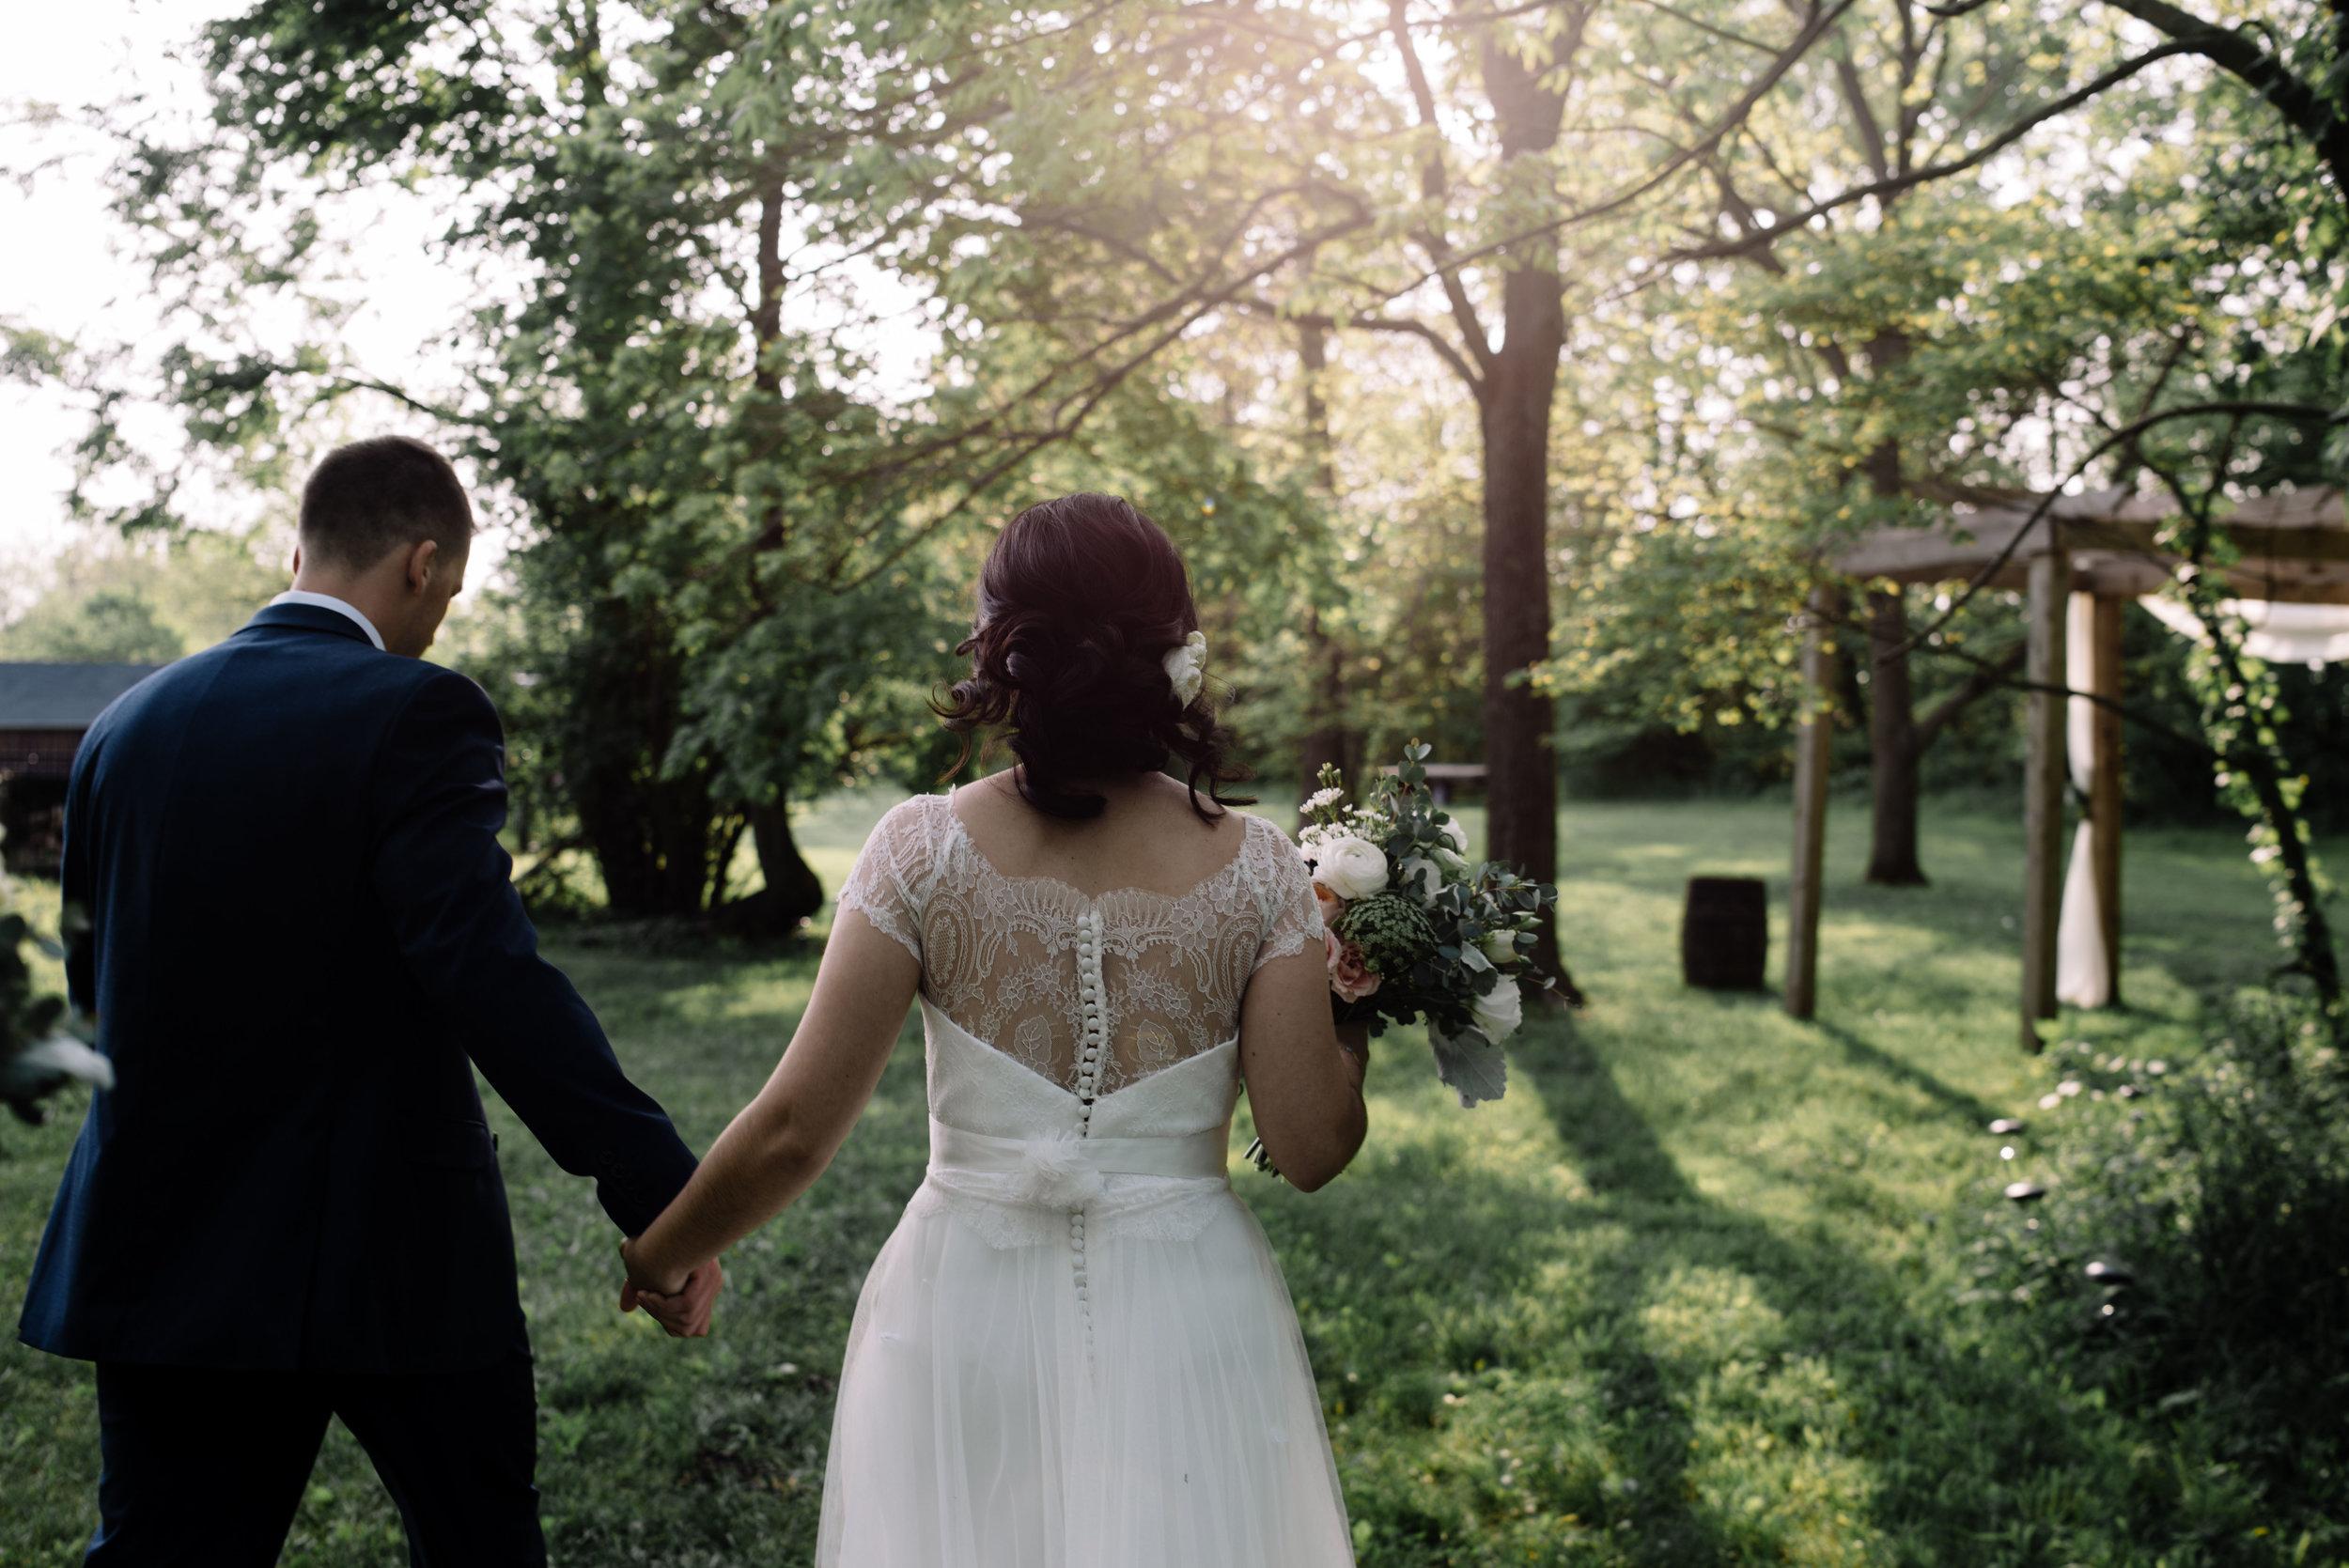 Ana-Dan-Blog-Indianapolis-Wedding-67.jpg